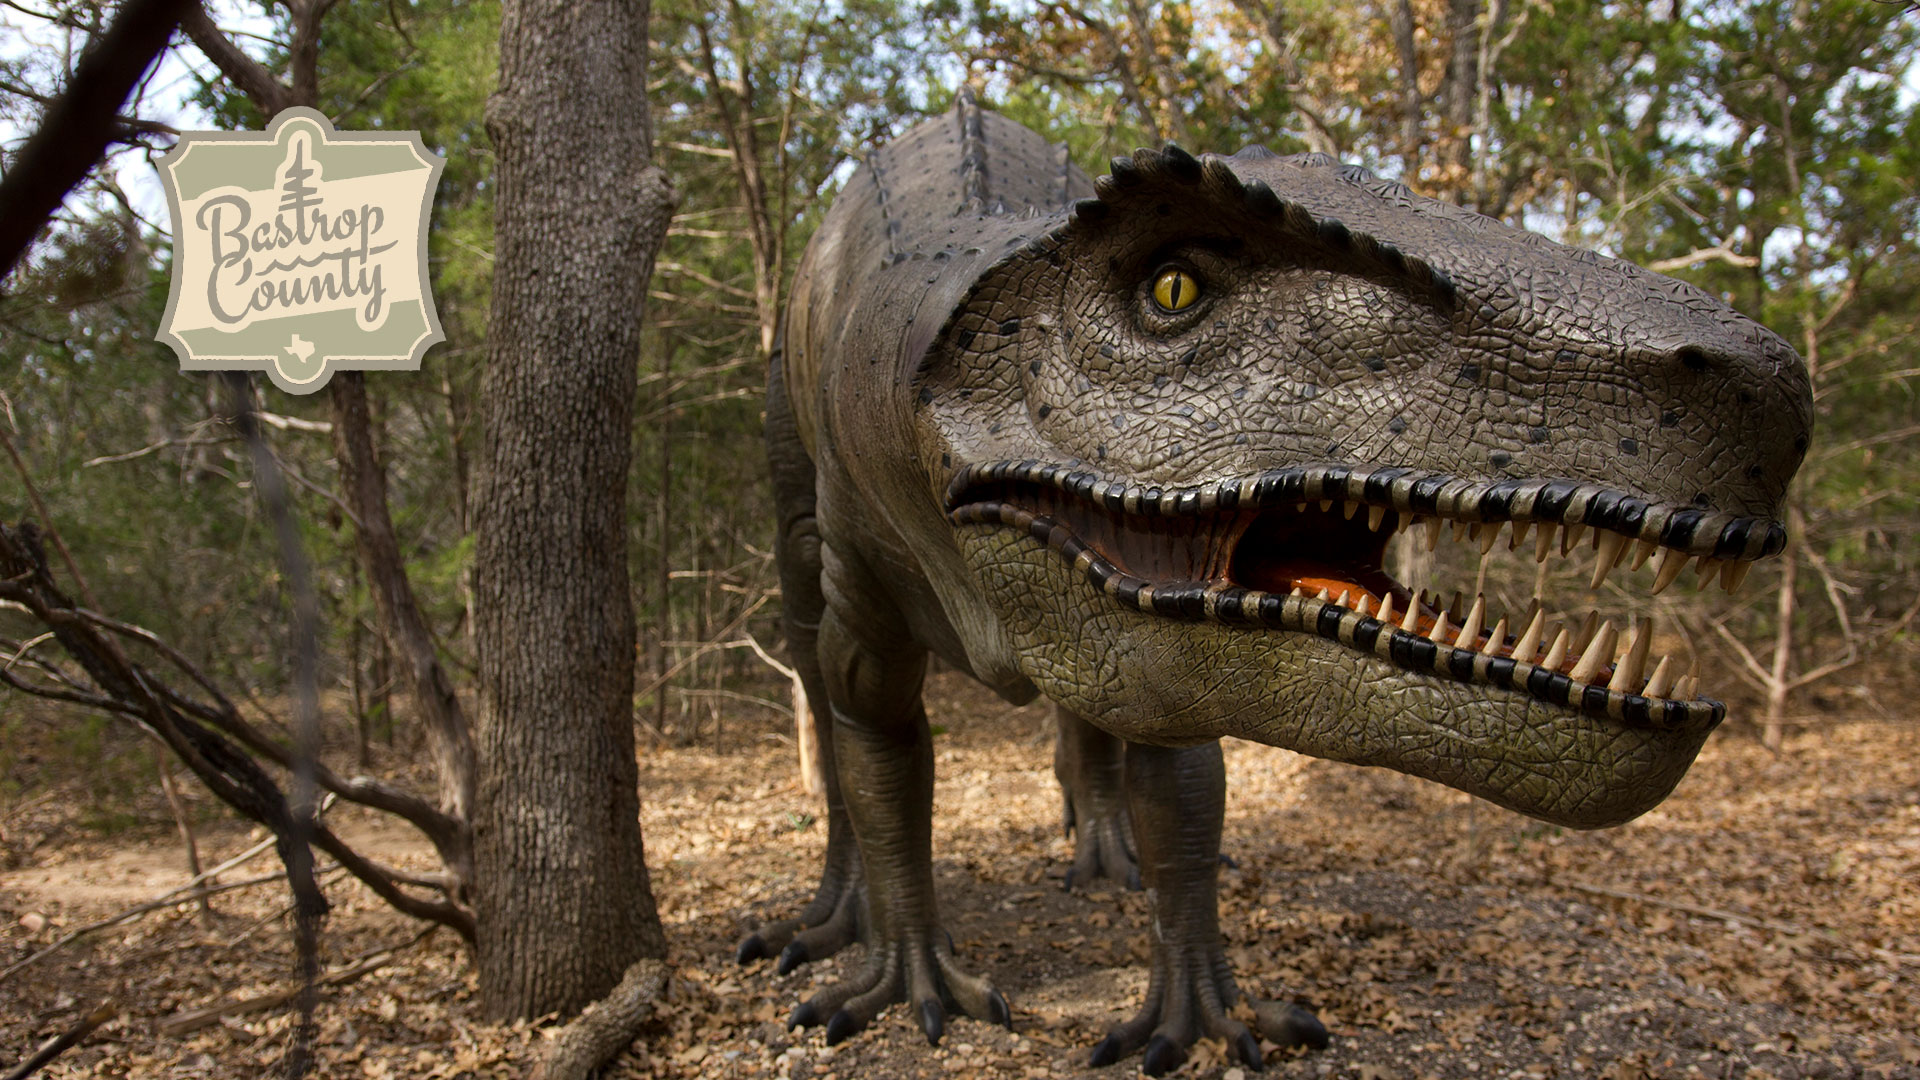 view of dinosaur sculpture along trail